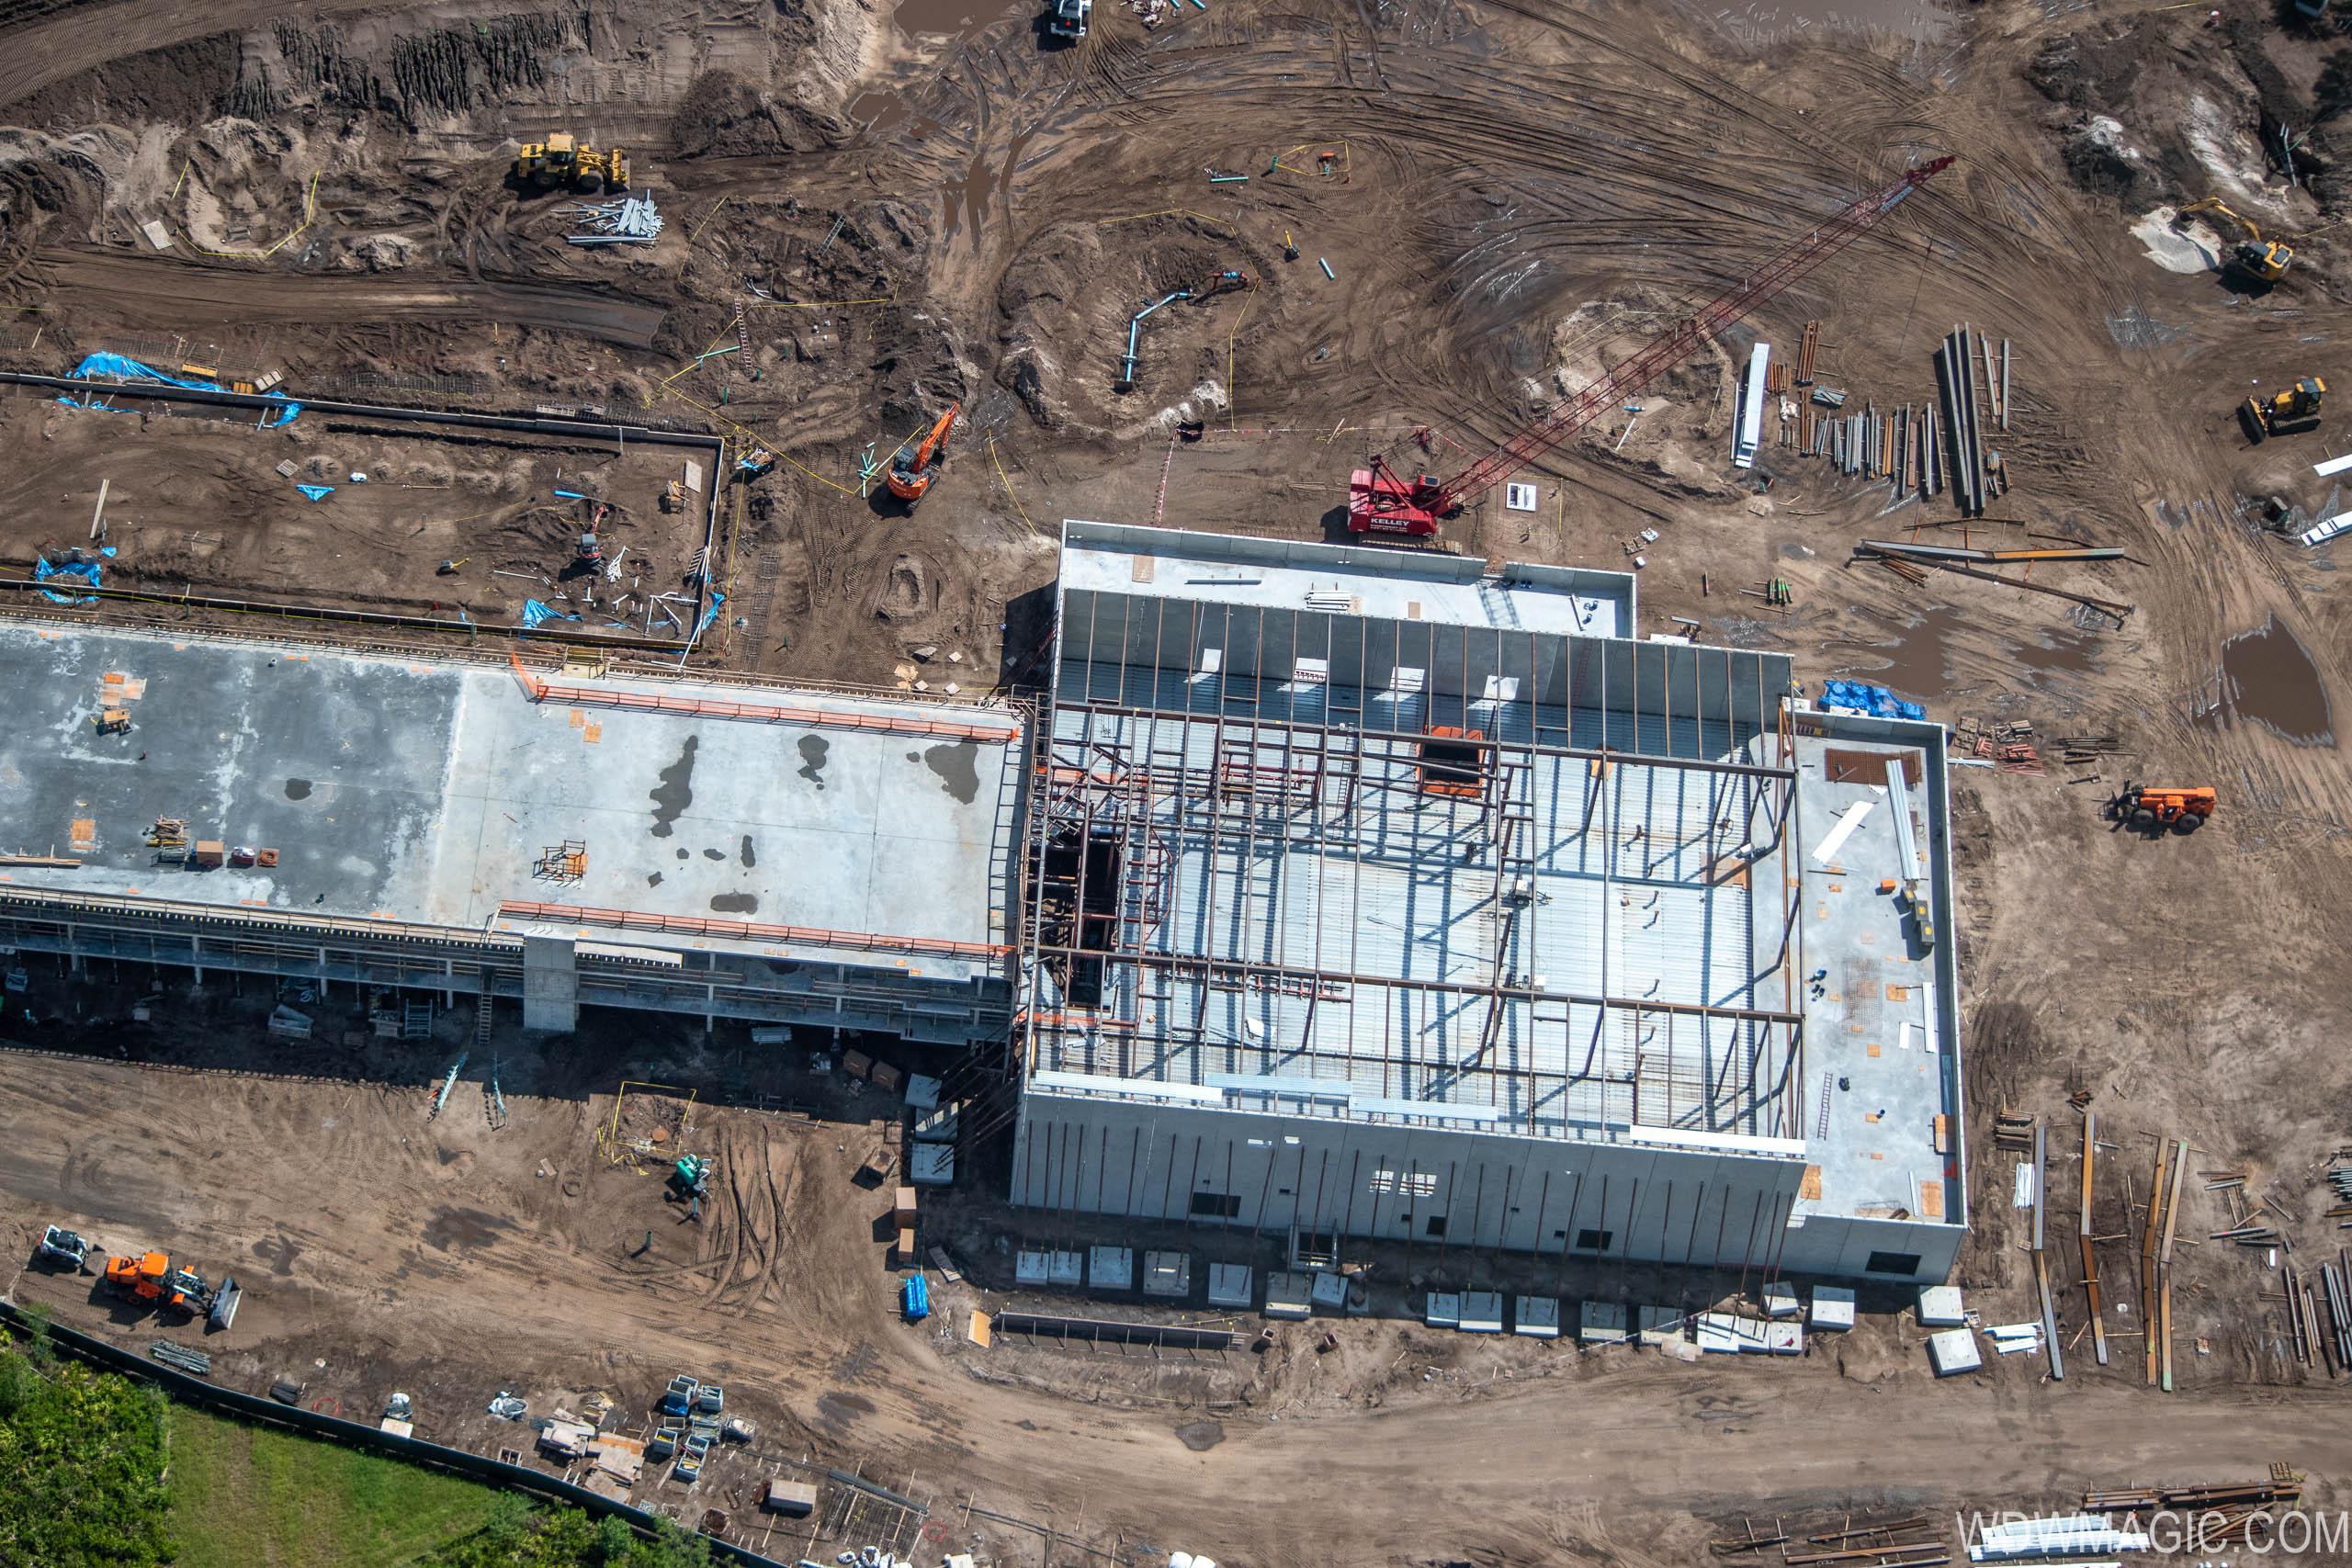 Star Wars hotel construction at Walt Disney World - July 2019